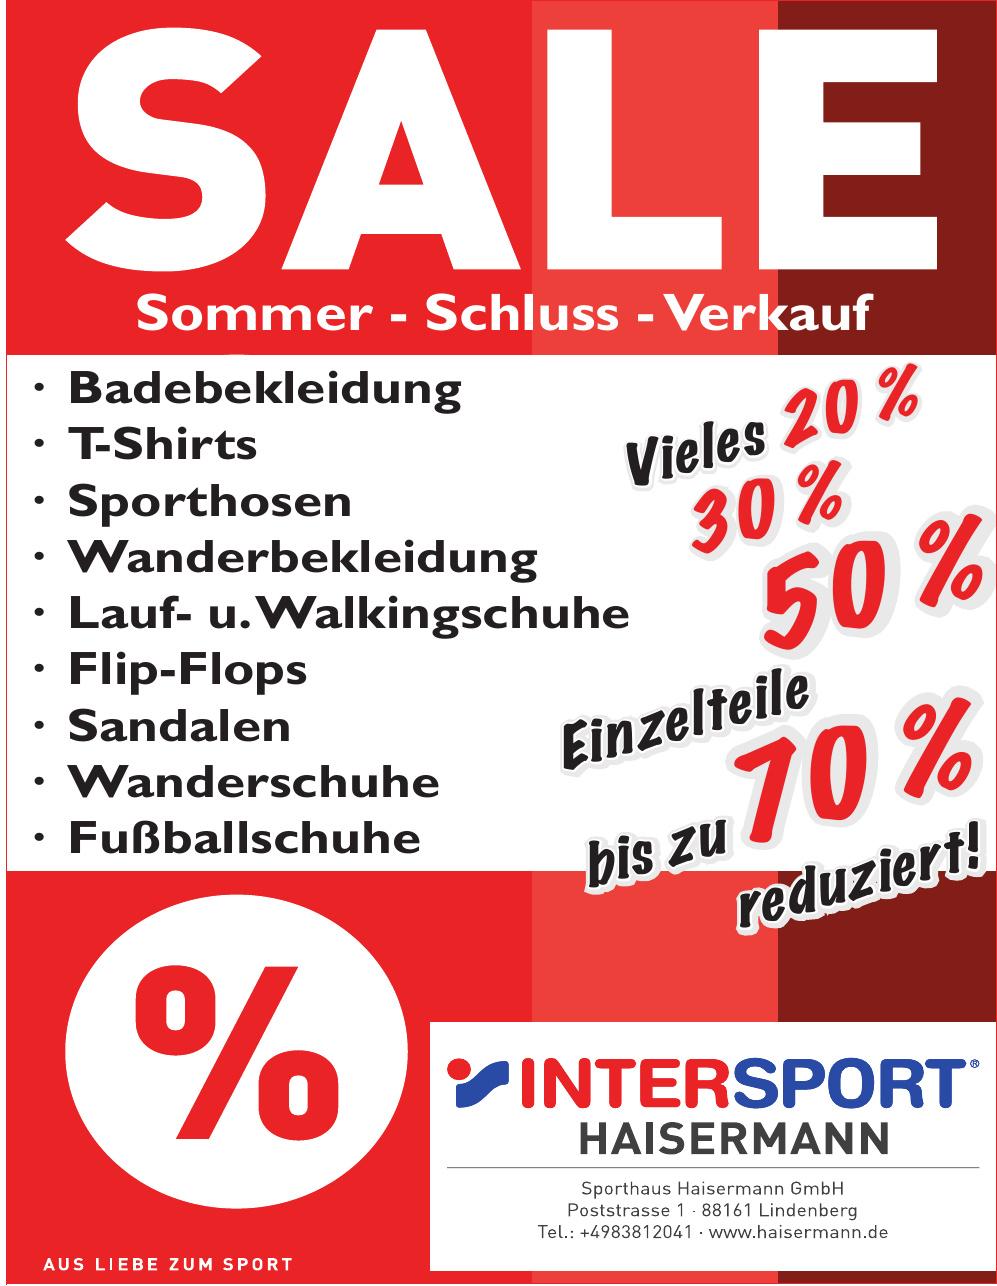 Intersport Haisermann